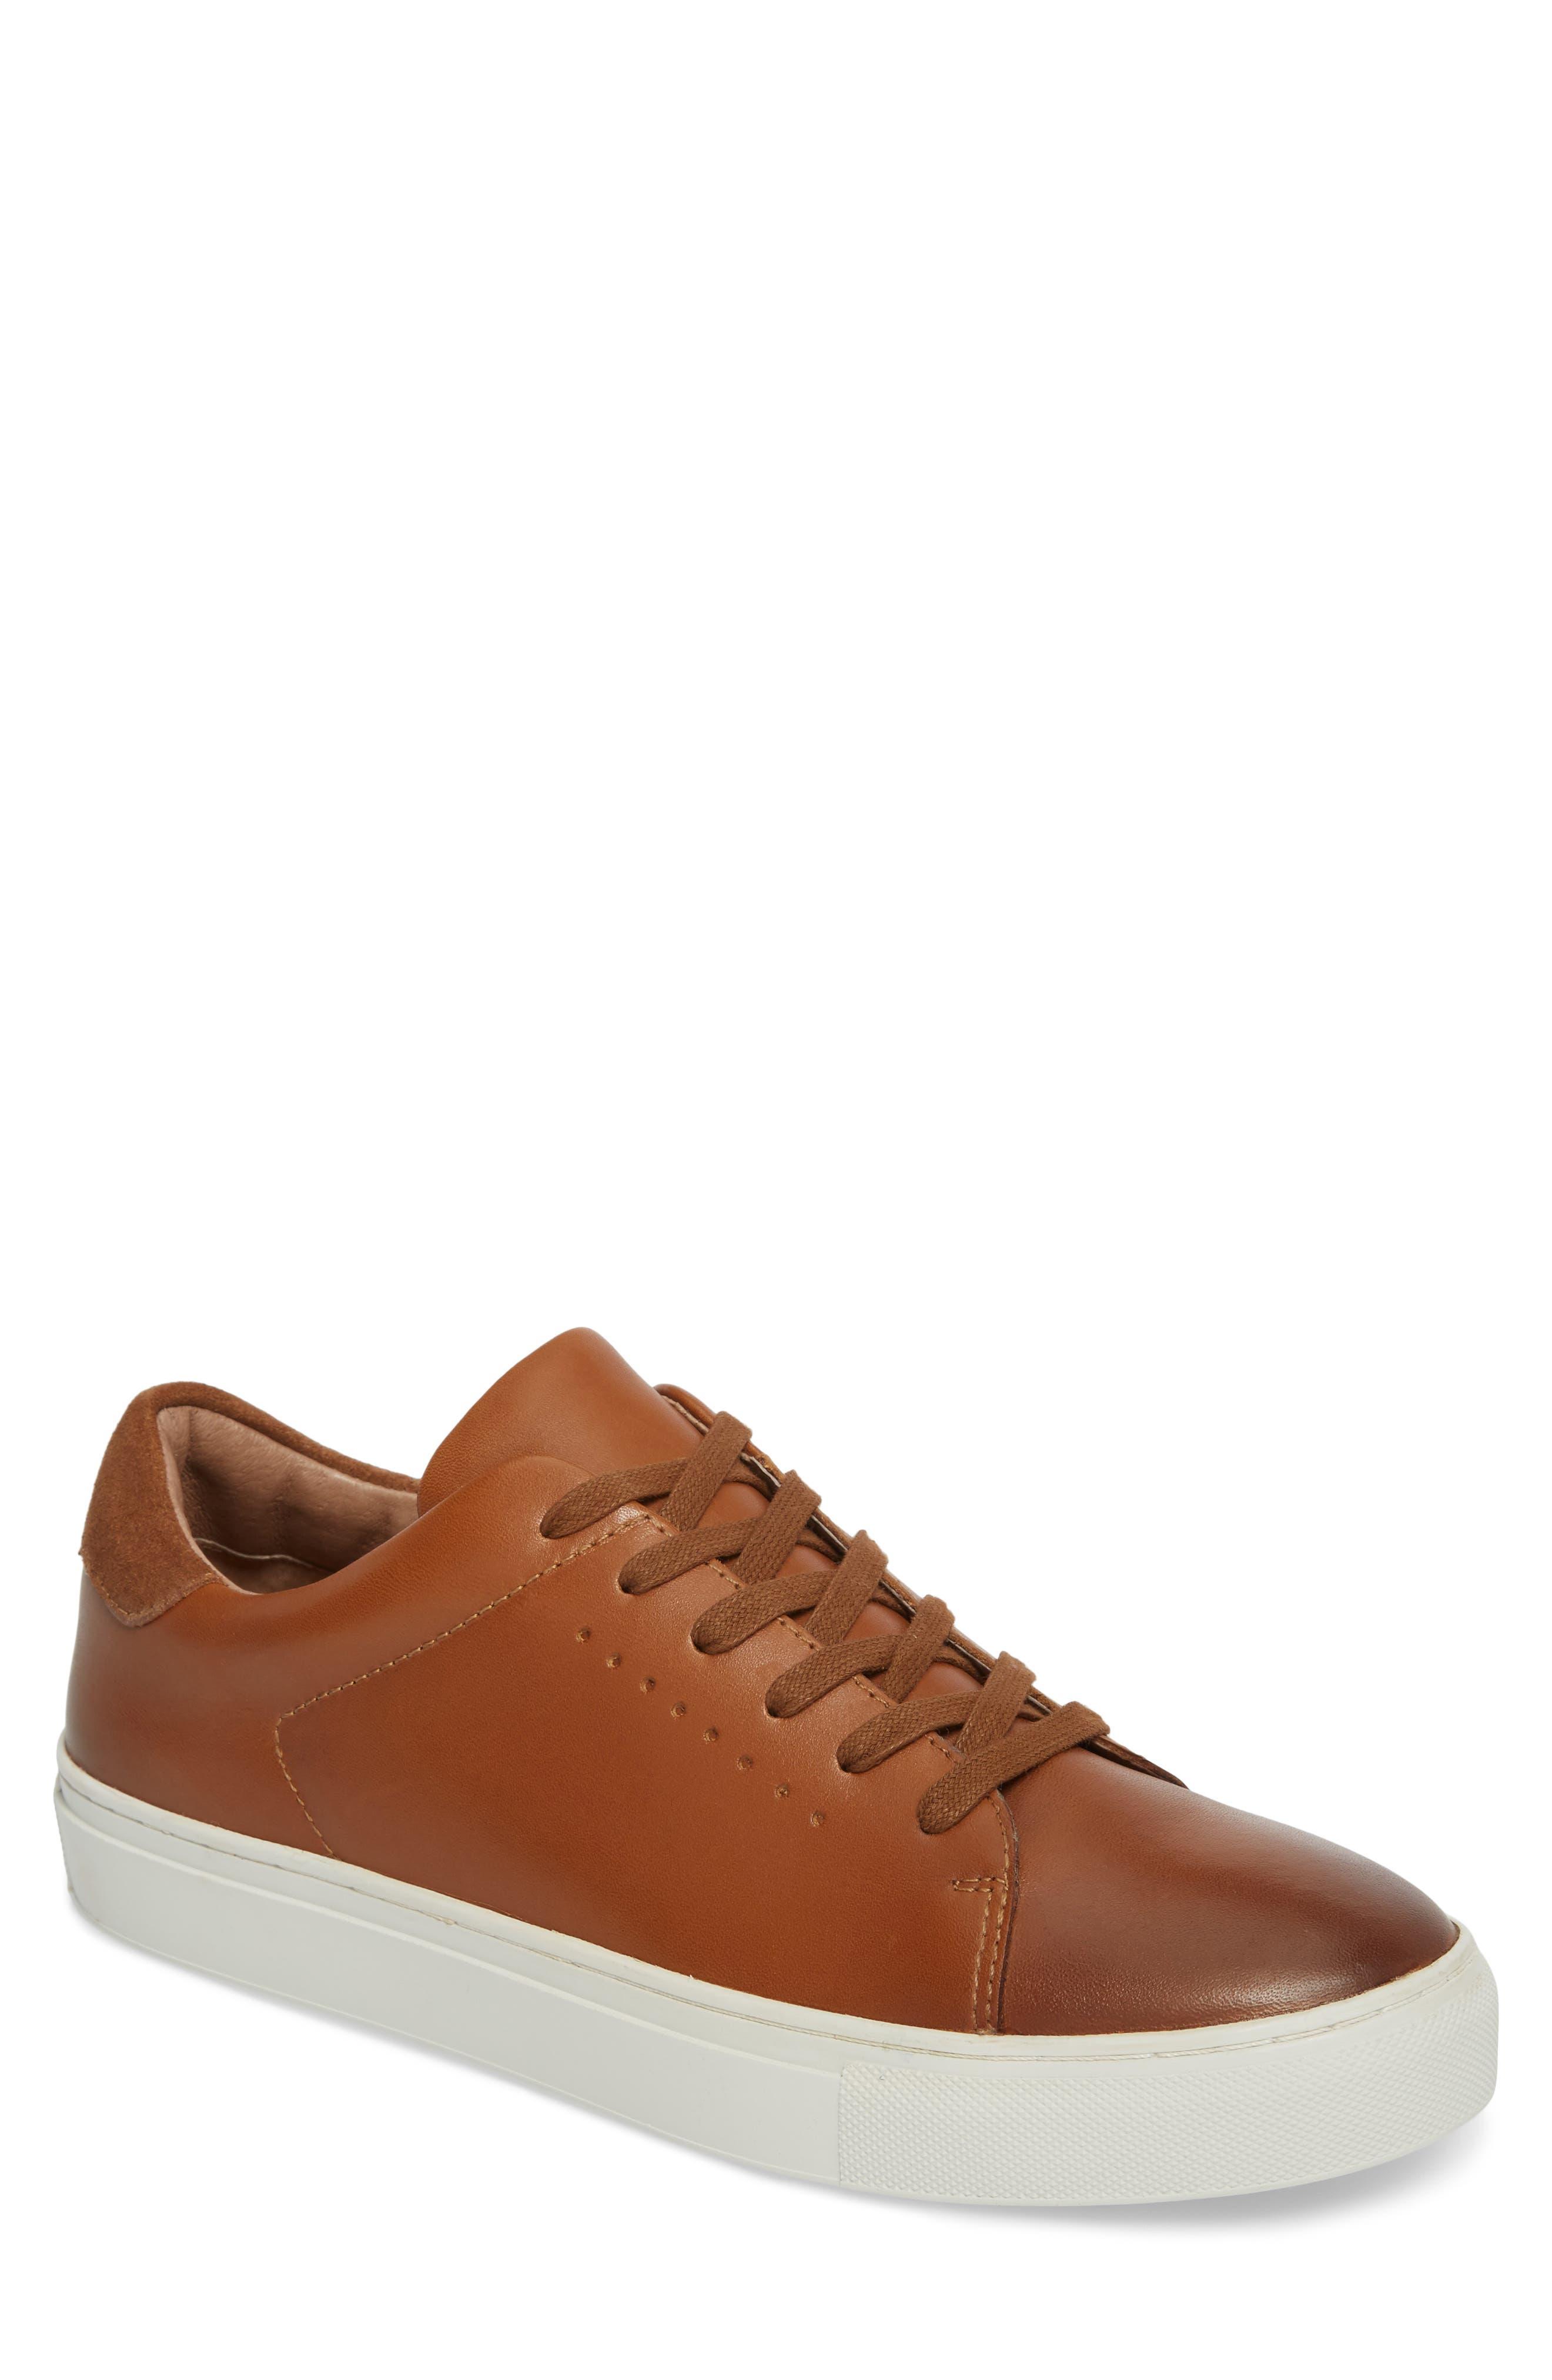 Desmond Sneaker,                             Main thumbnail 1, color,                             Tan Leather